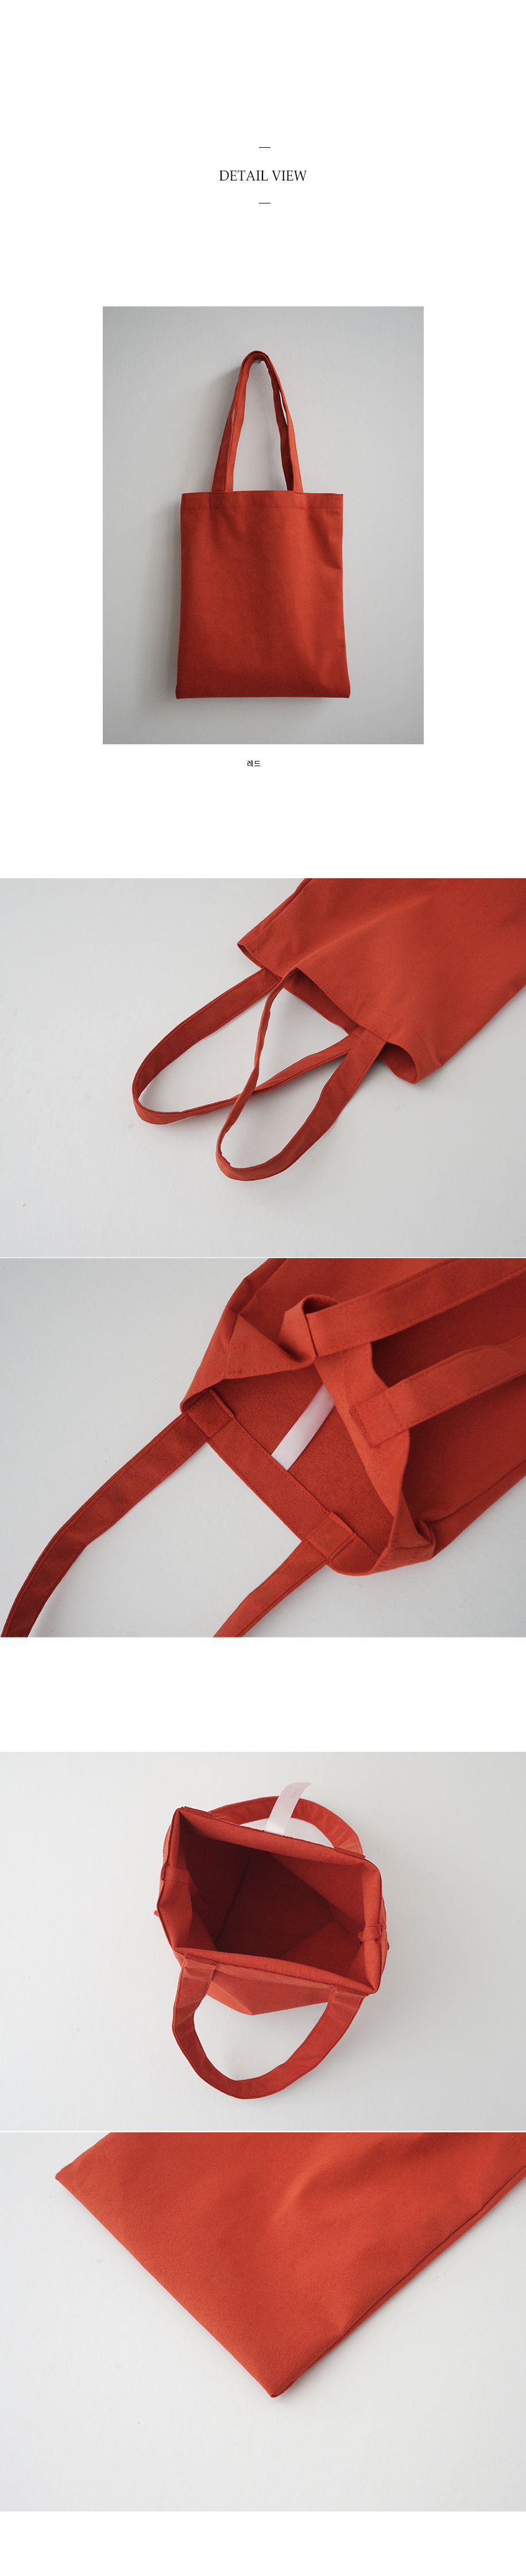 red fleecy eco bag